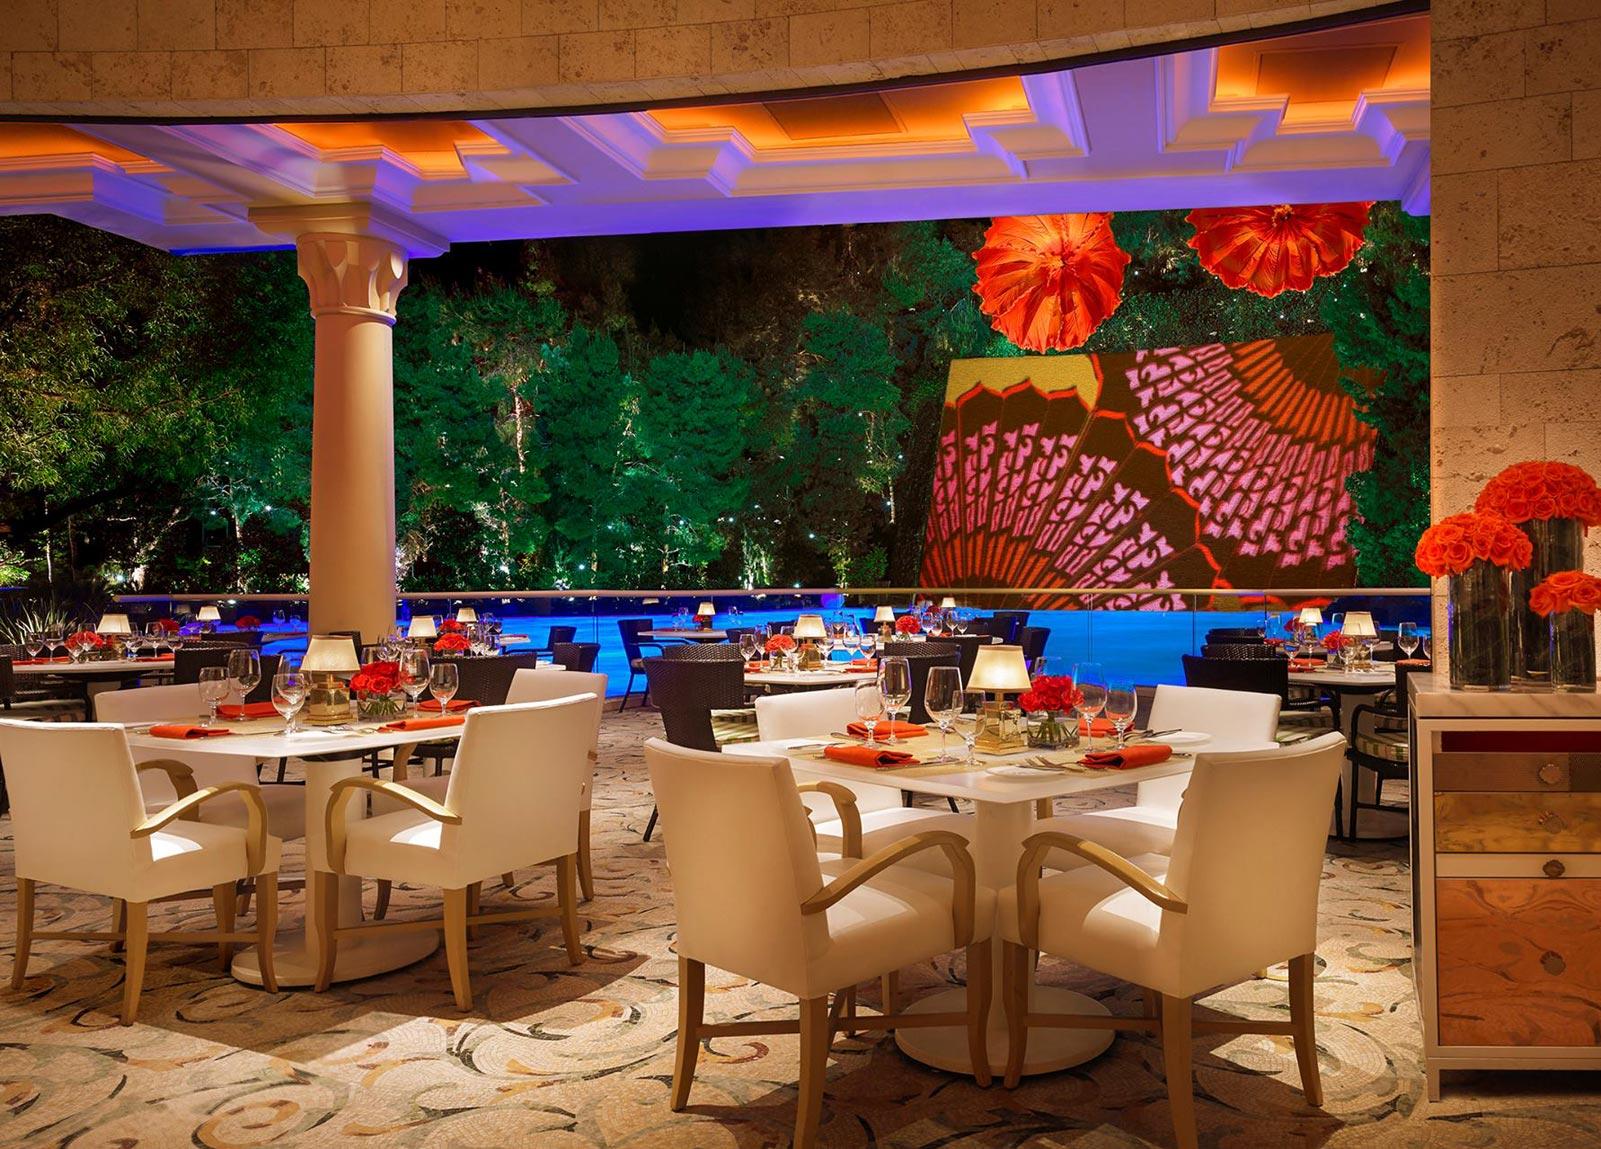 Wynn Vegas Restaurants - Where to Eat at Wynn Las Vegas